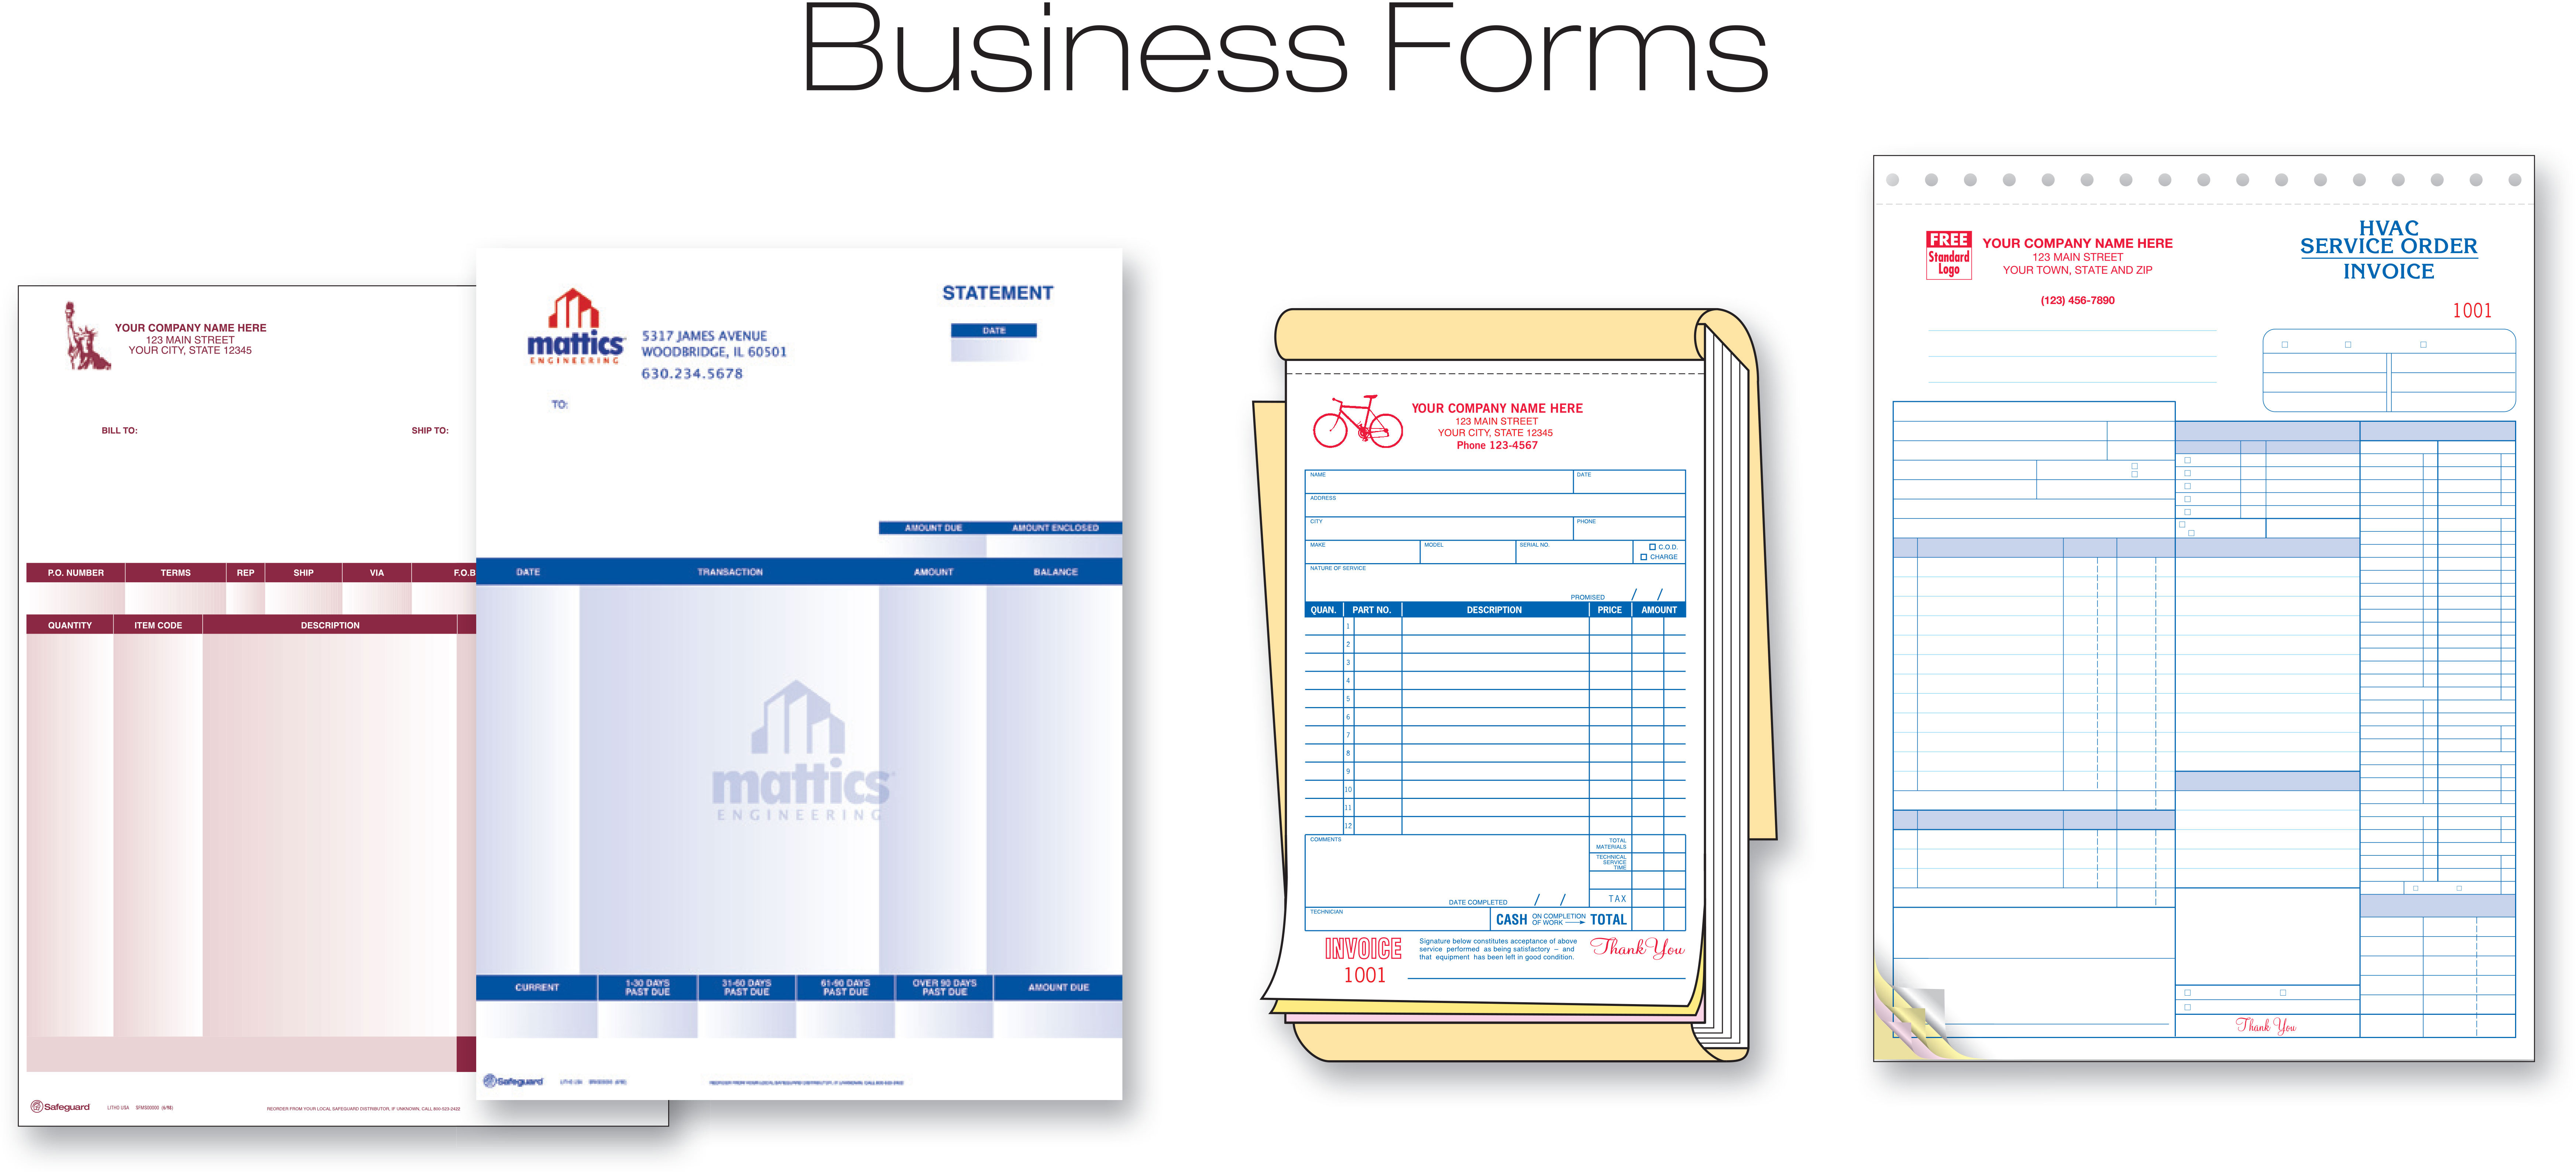 Safegurad® Business Forms